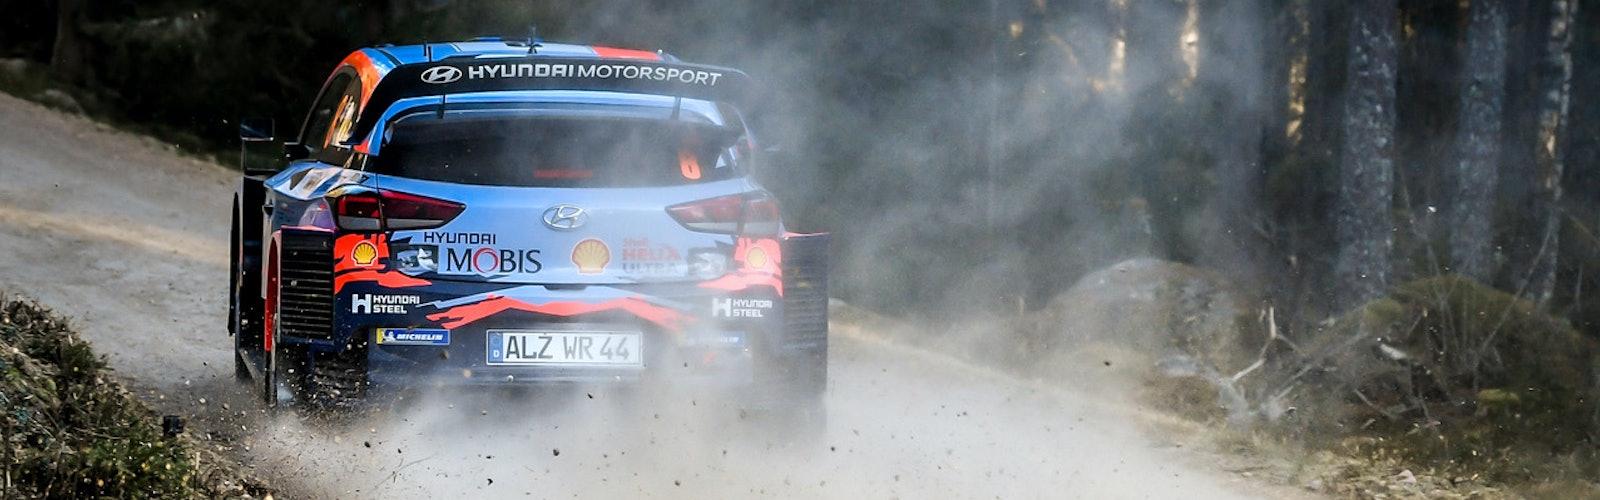 Ott Tänak, Hyundai, WRC Rally Sweden 2020